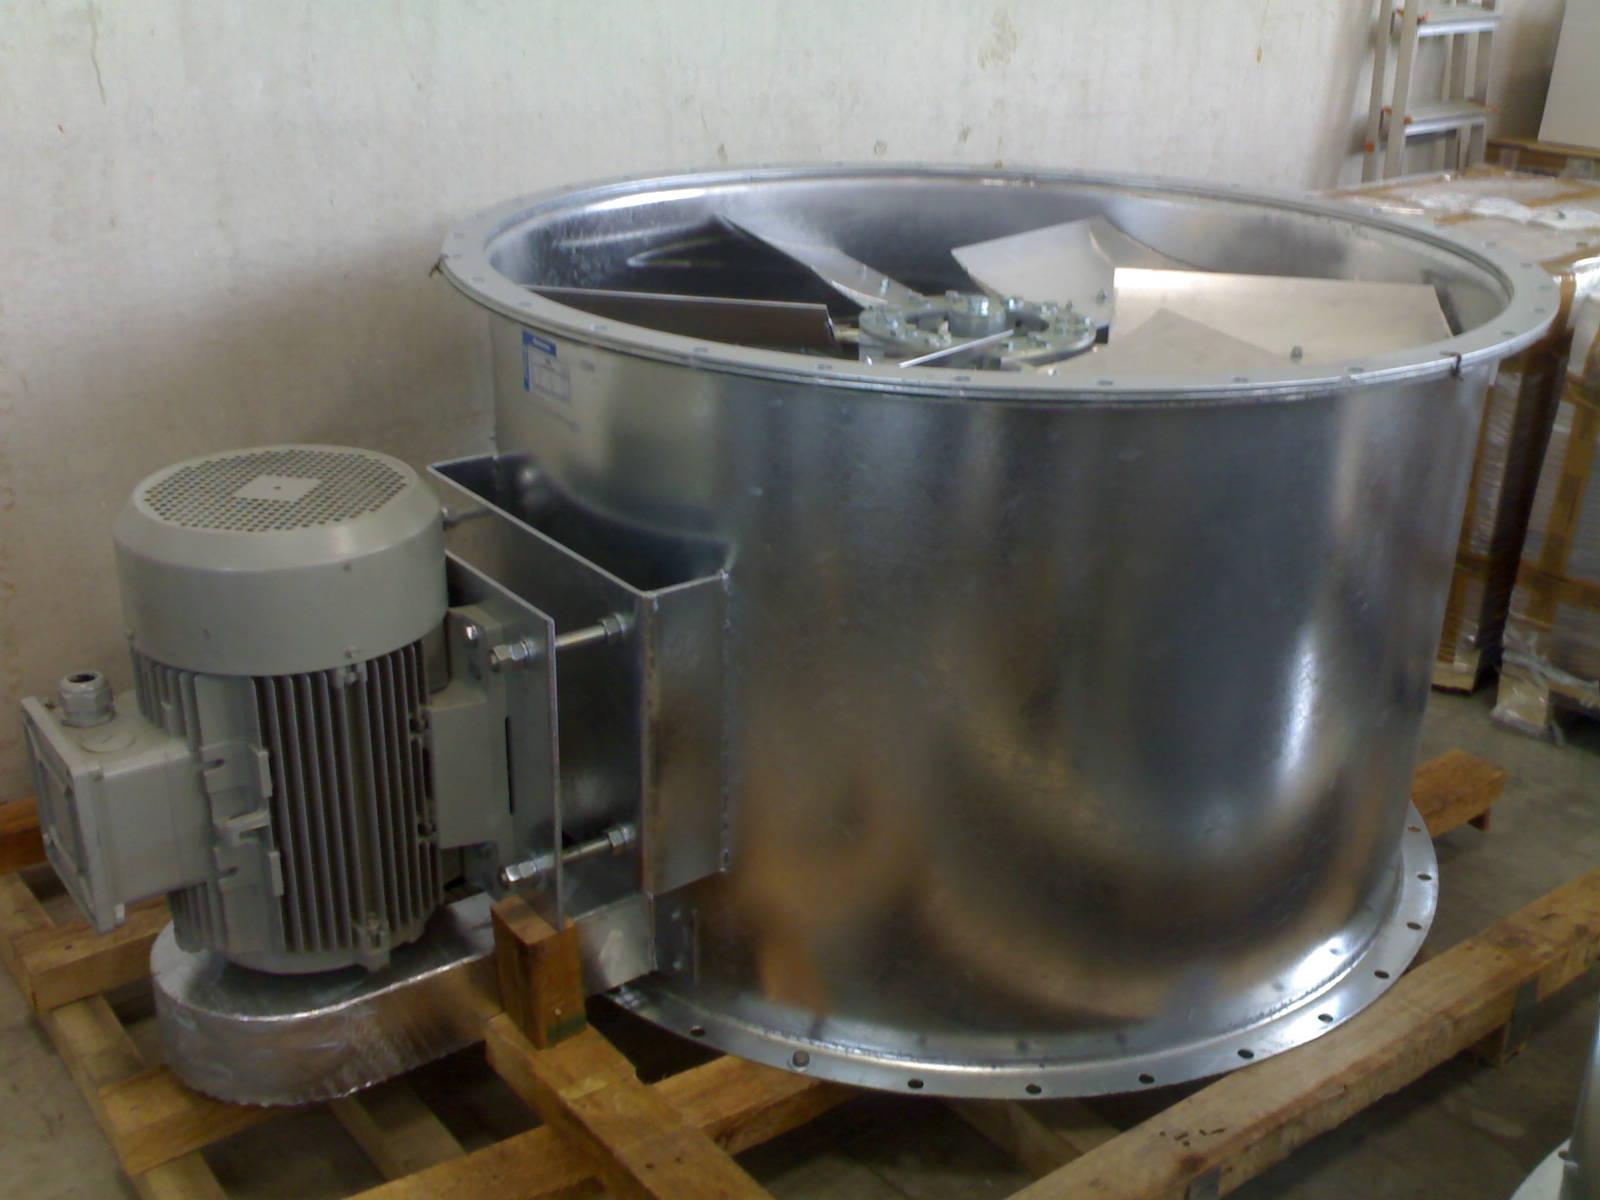 Axialventilator mit Keilriemenantrieb